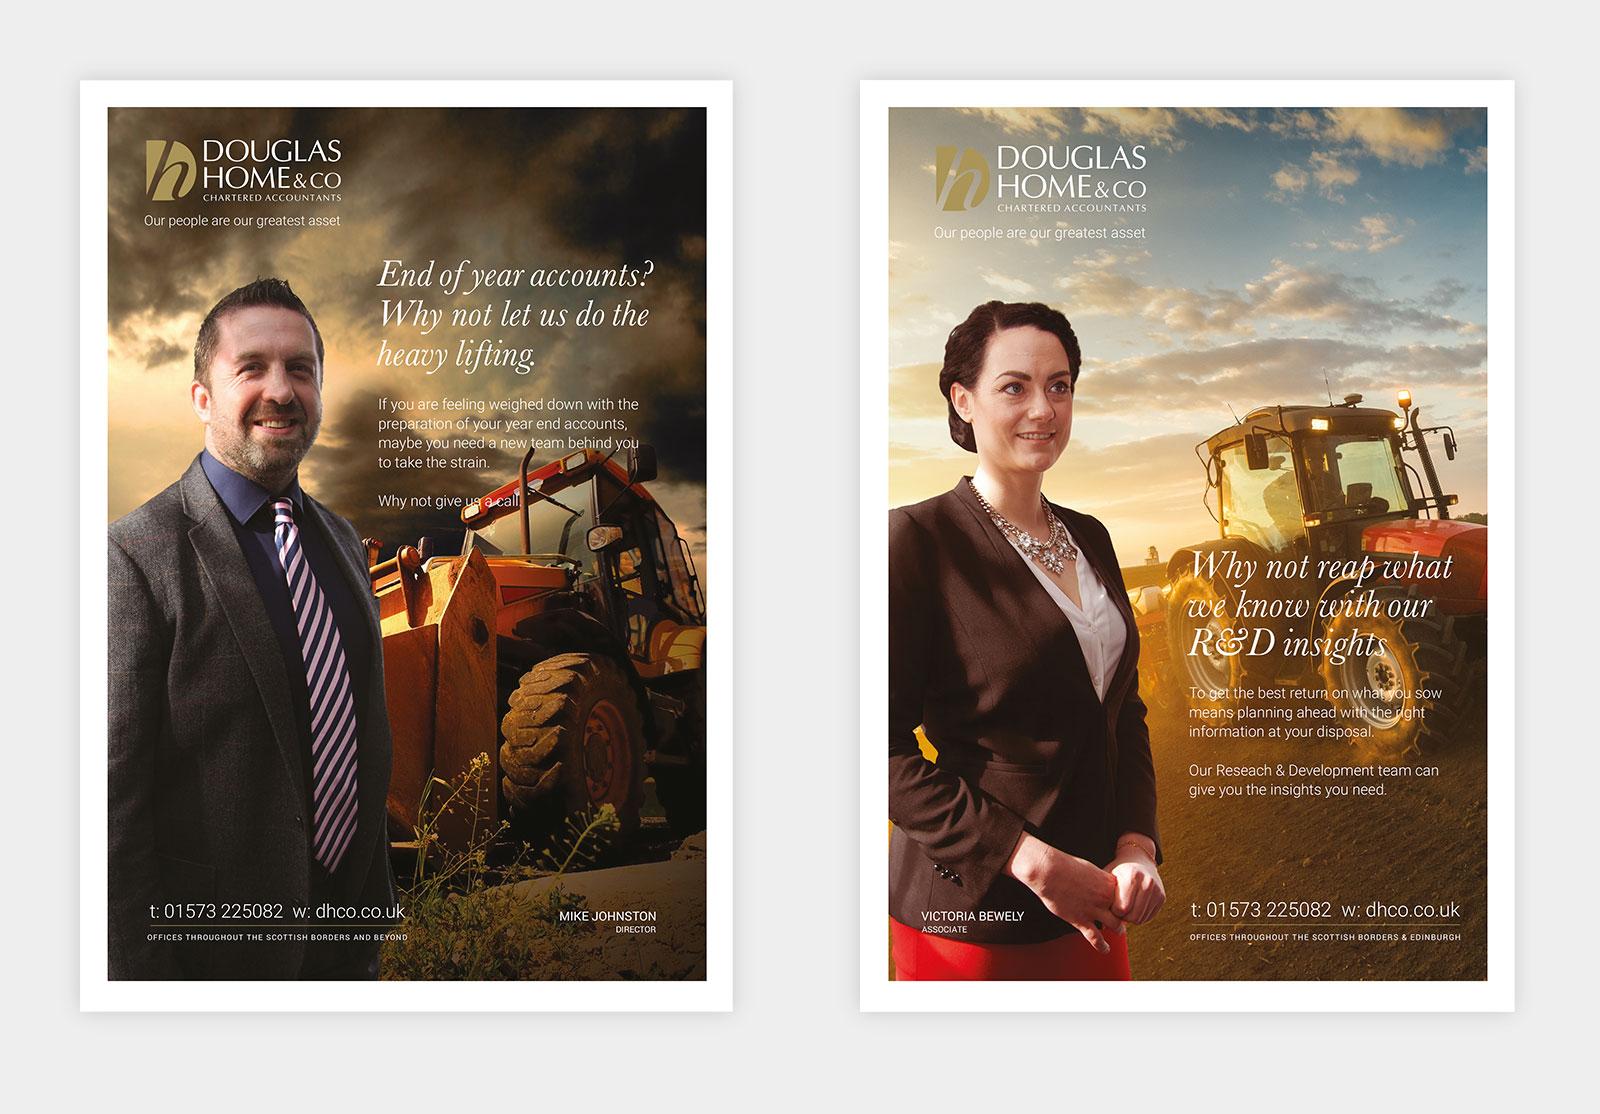 John Hamlin Douglas Home & Co Advertising Campaign